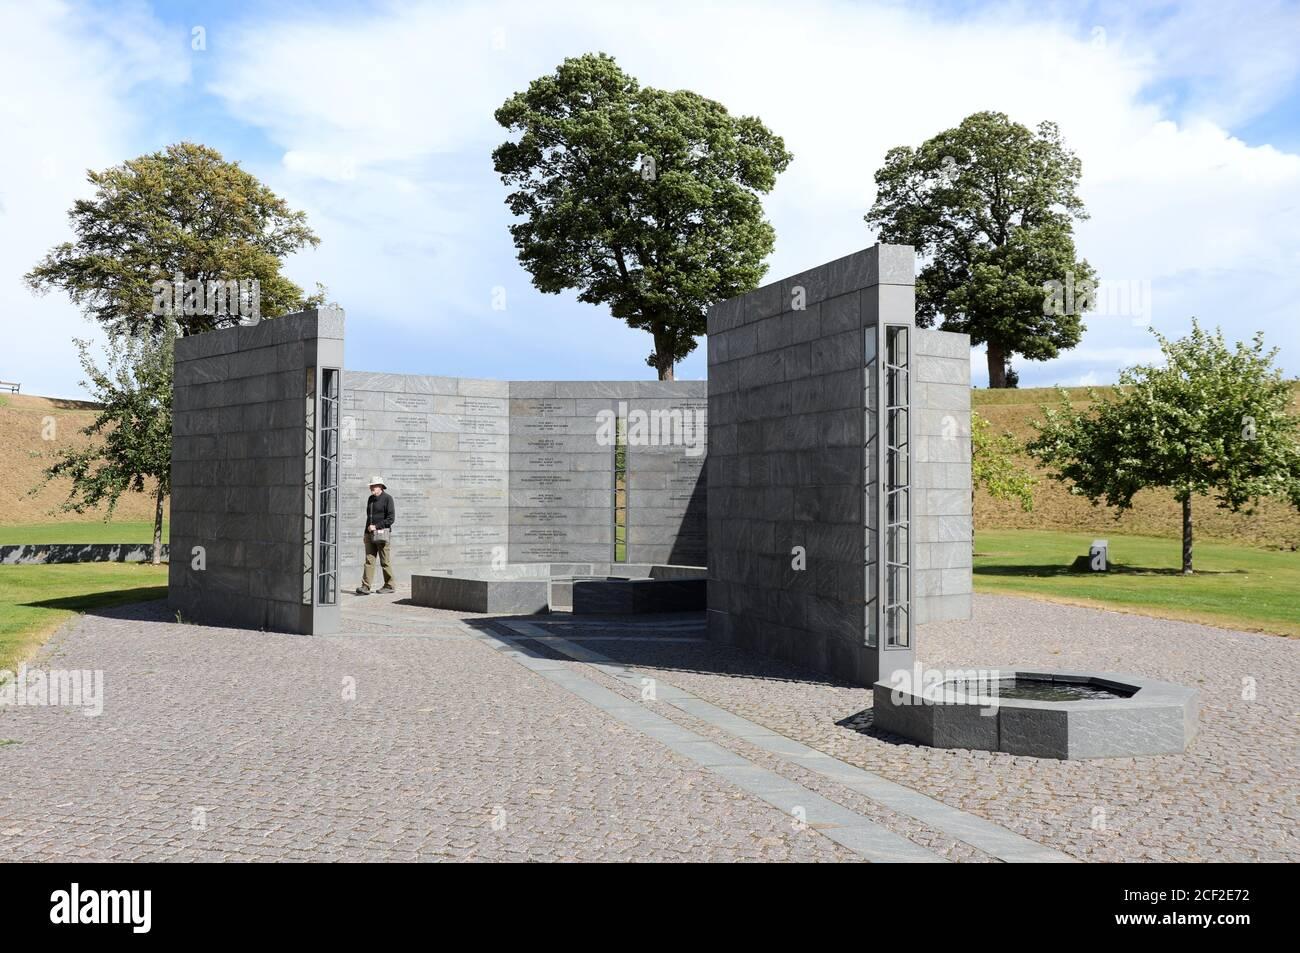 Monumento de Finn Reinbothe en el Kastellet en Copenhague Foto de stock